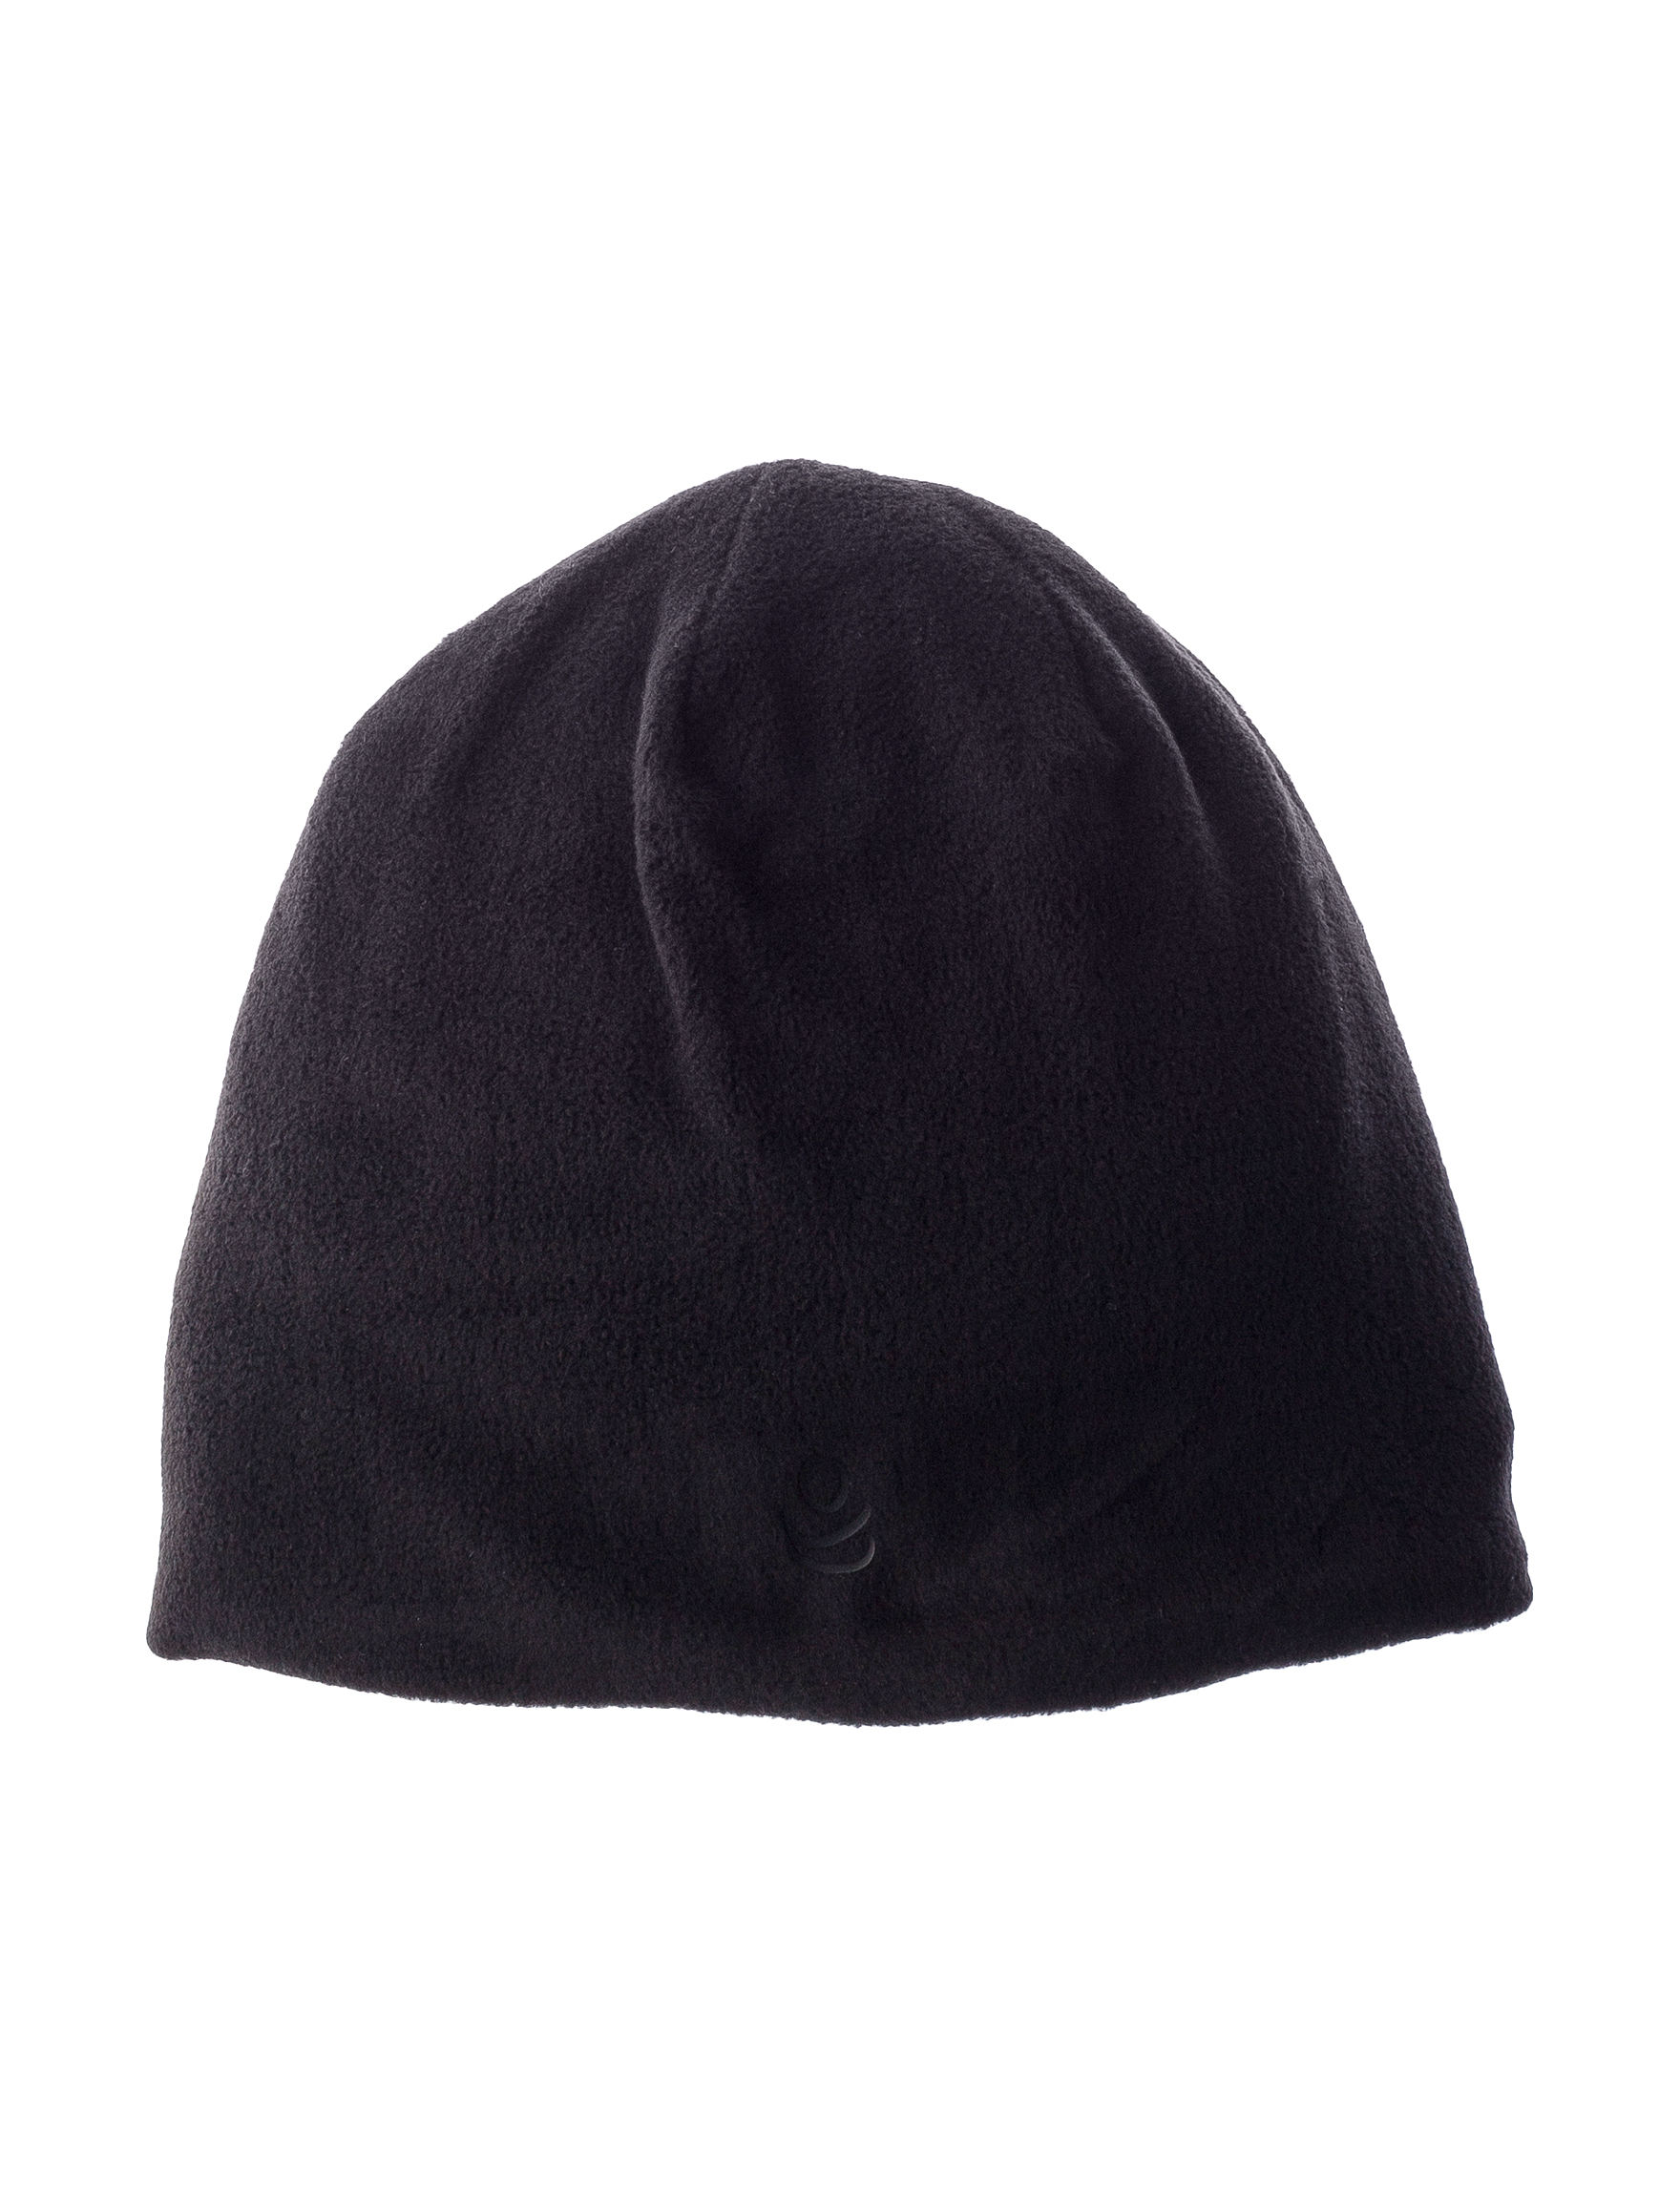 Cuddl Duds Black Hats & Headwear